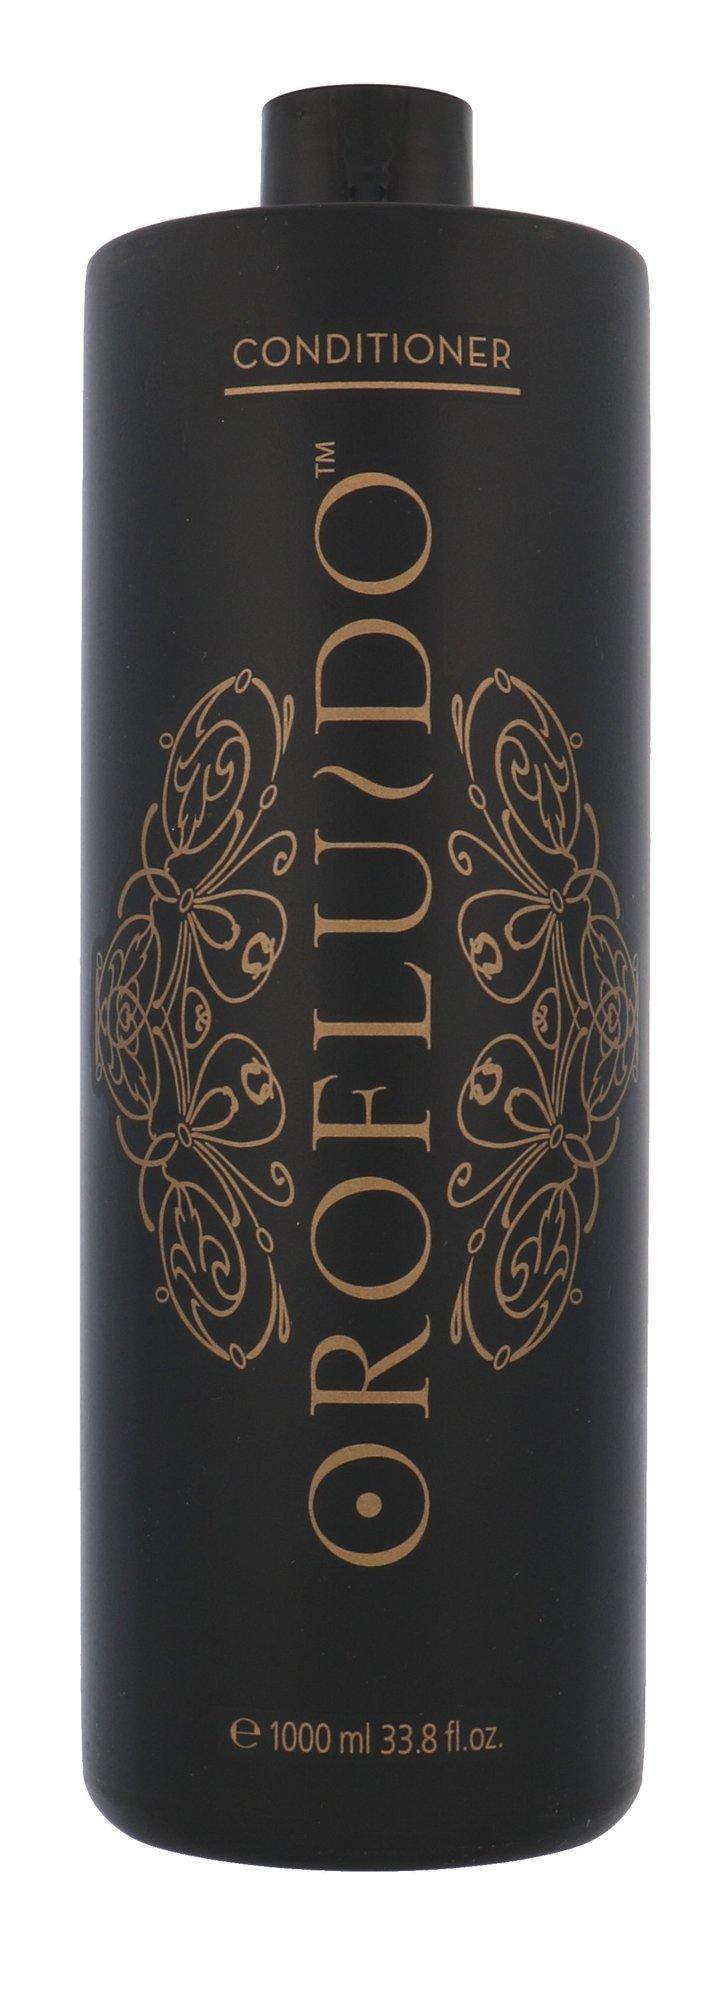 Orofluido Conditioner Cosmetic 1000ml